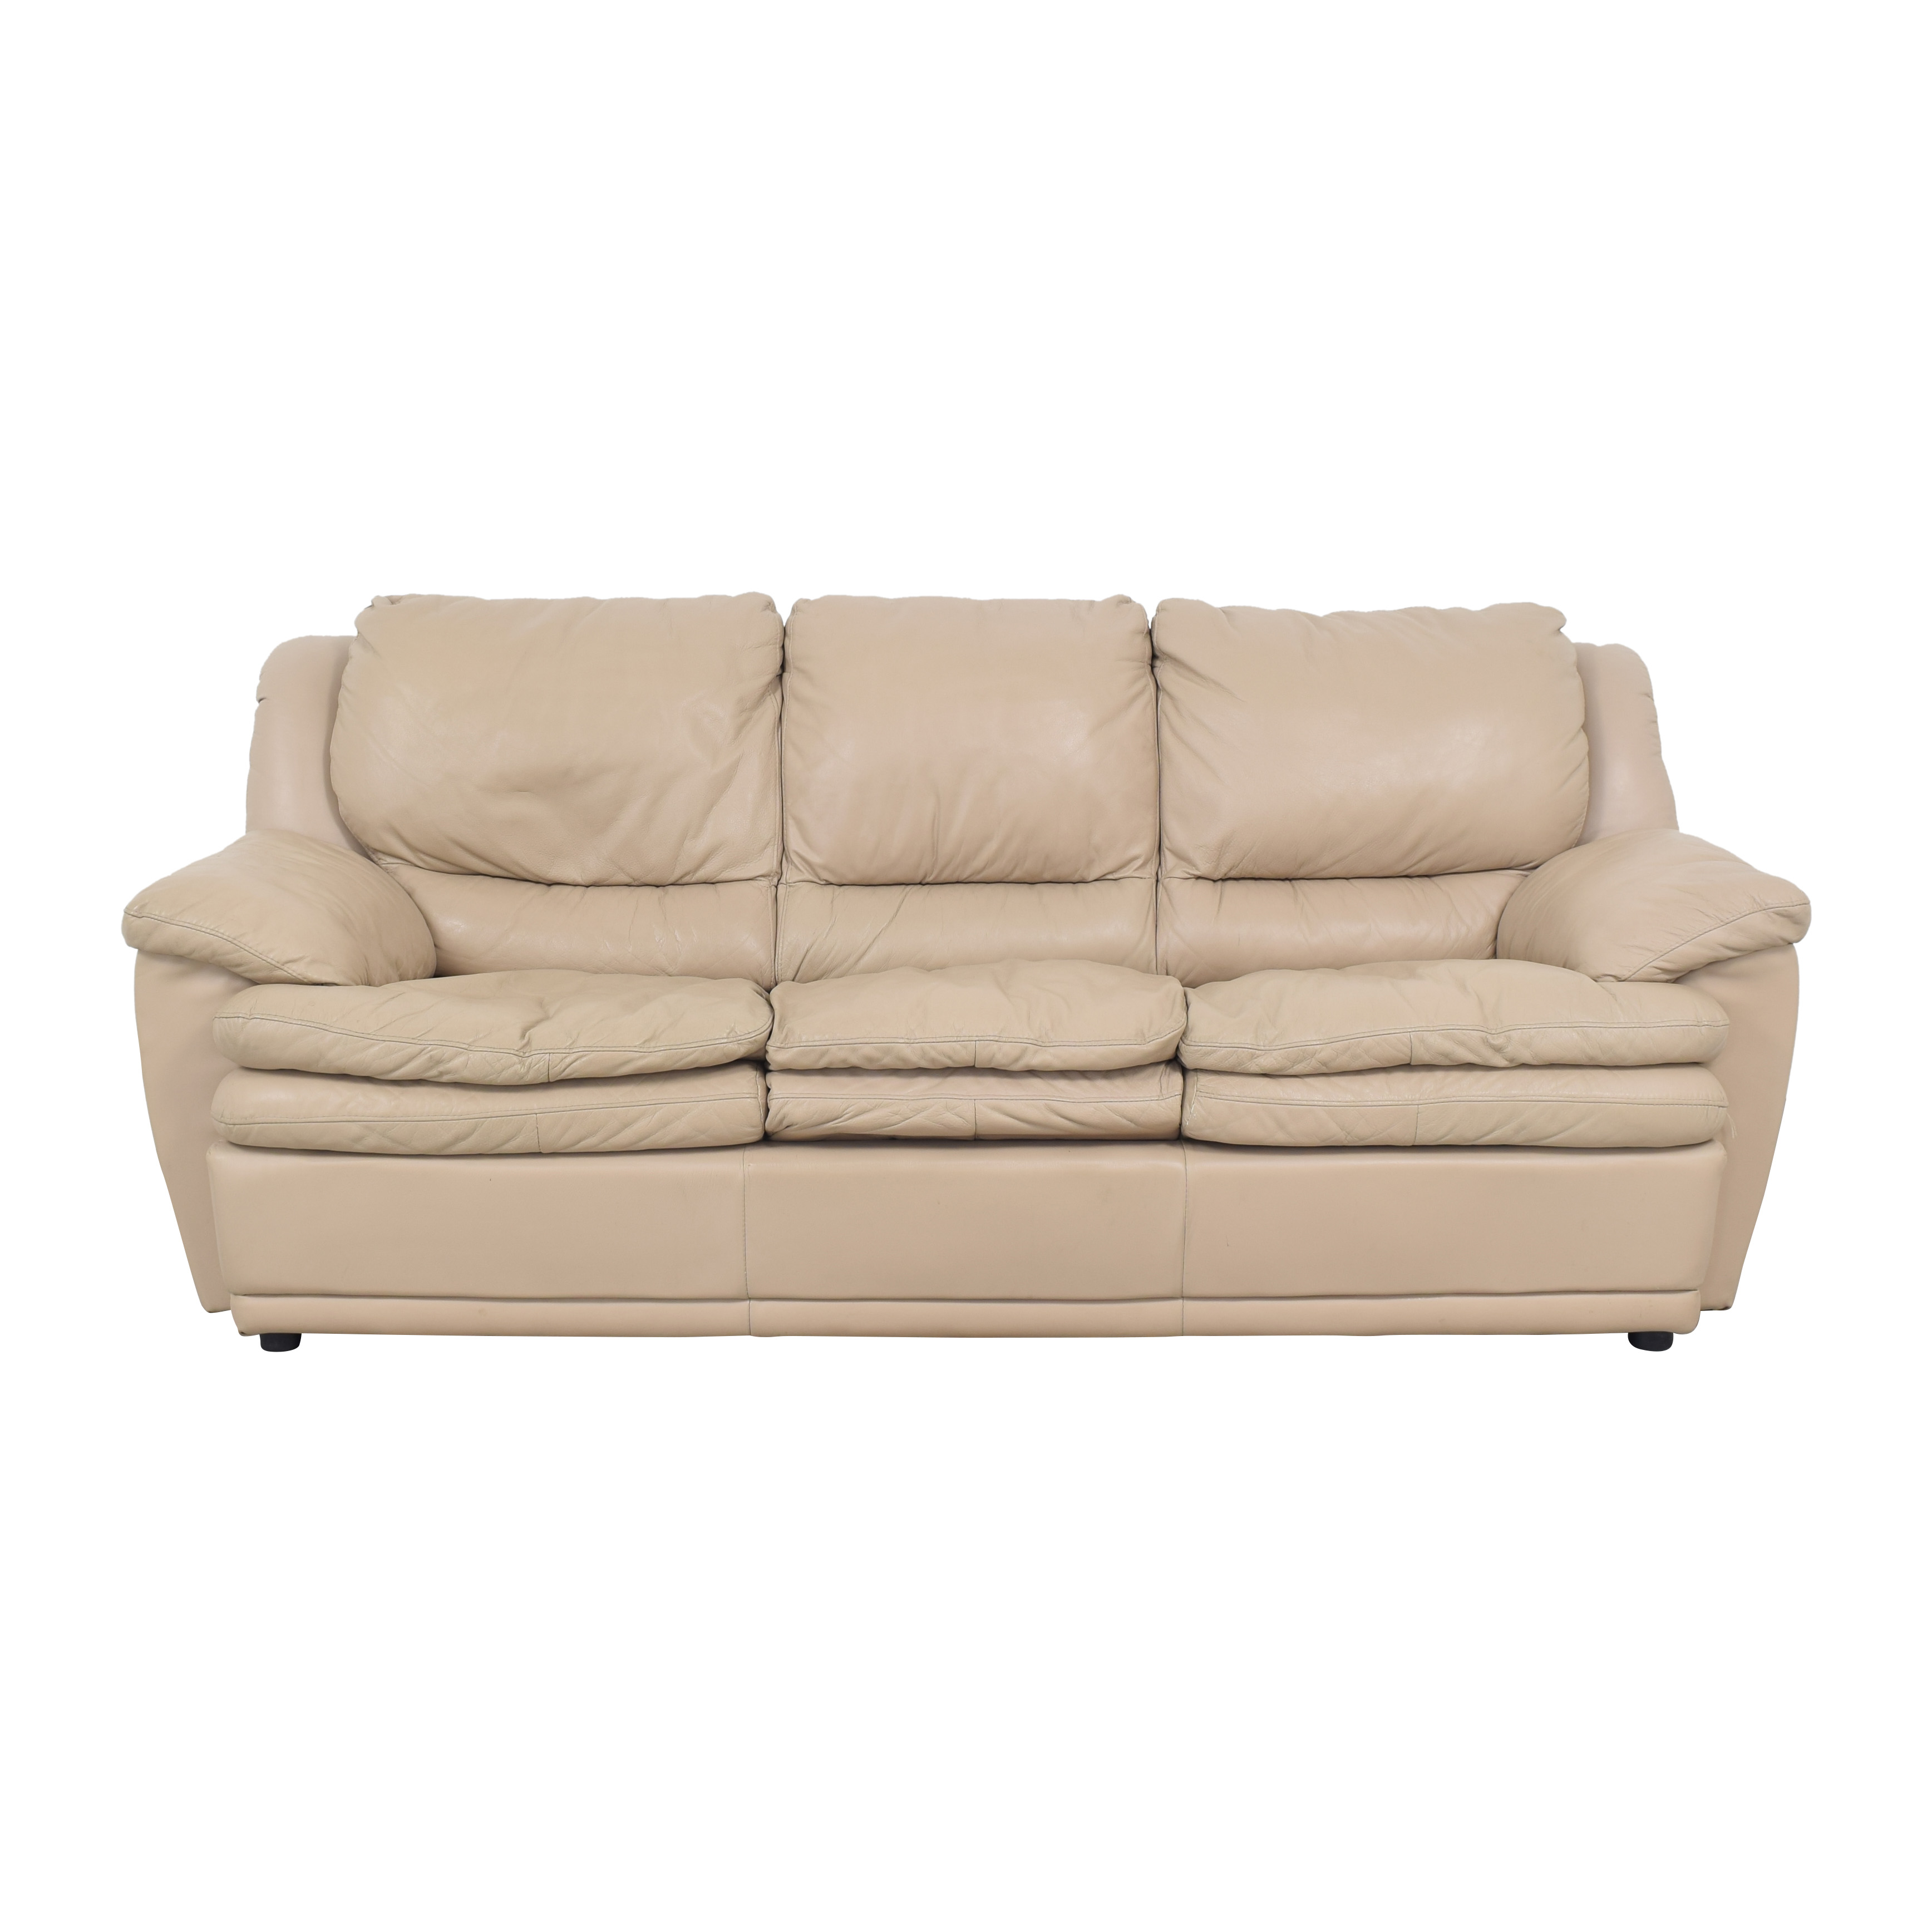 DeCoro Leather Sleeper Sofa sale